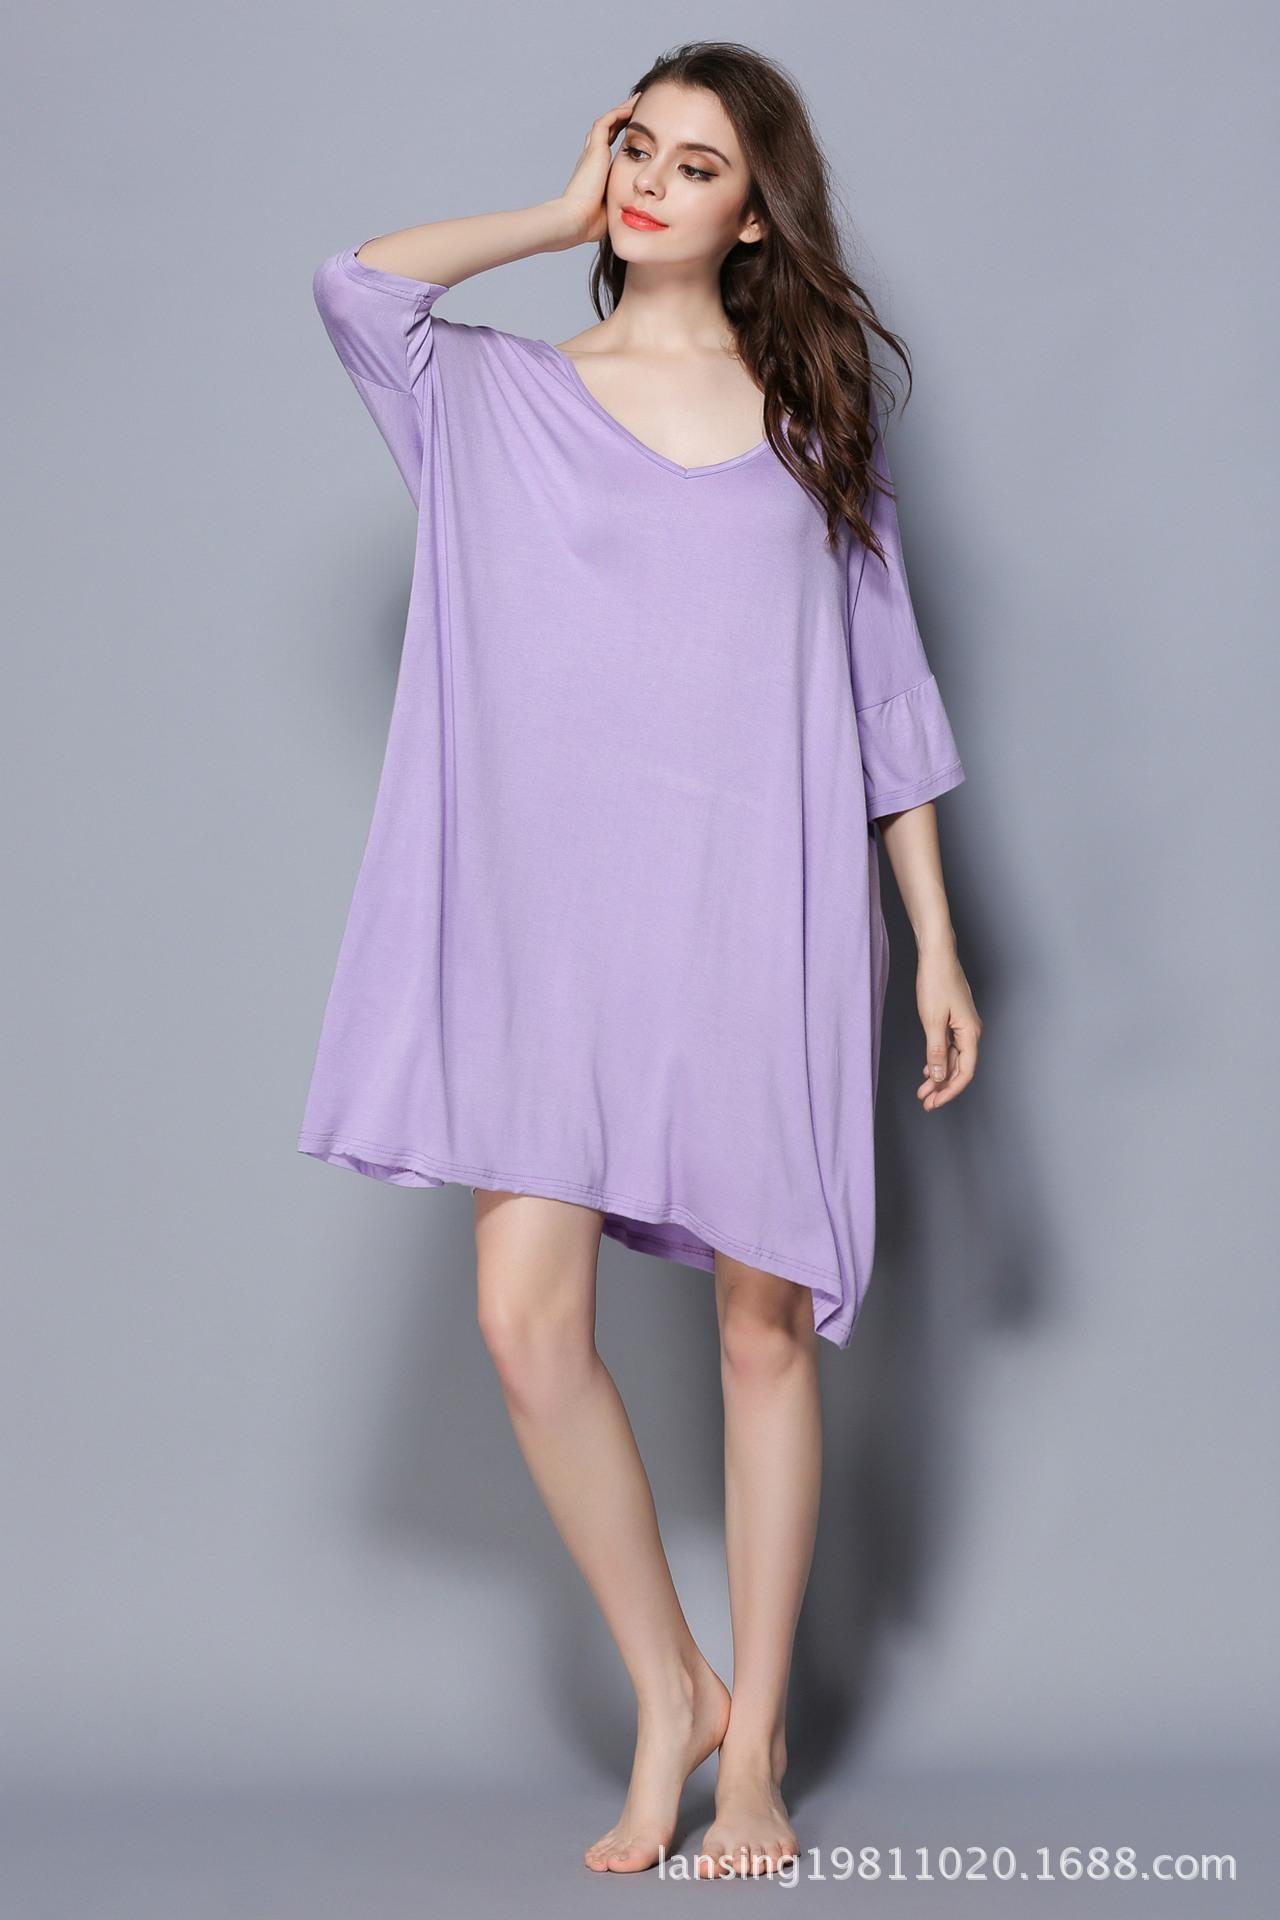 Nightdress spring and summer new medium and long T-shirt medium sleeve large size nightdress modal Pajama has fat plus size women Lavender